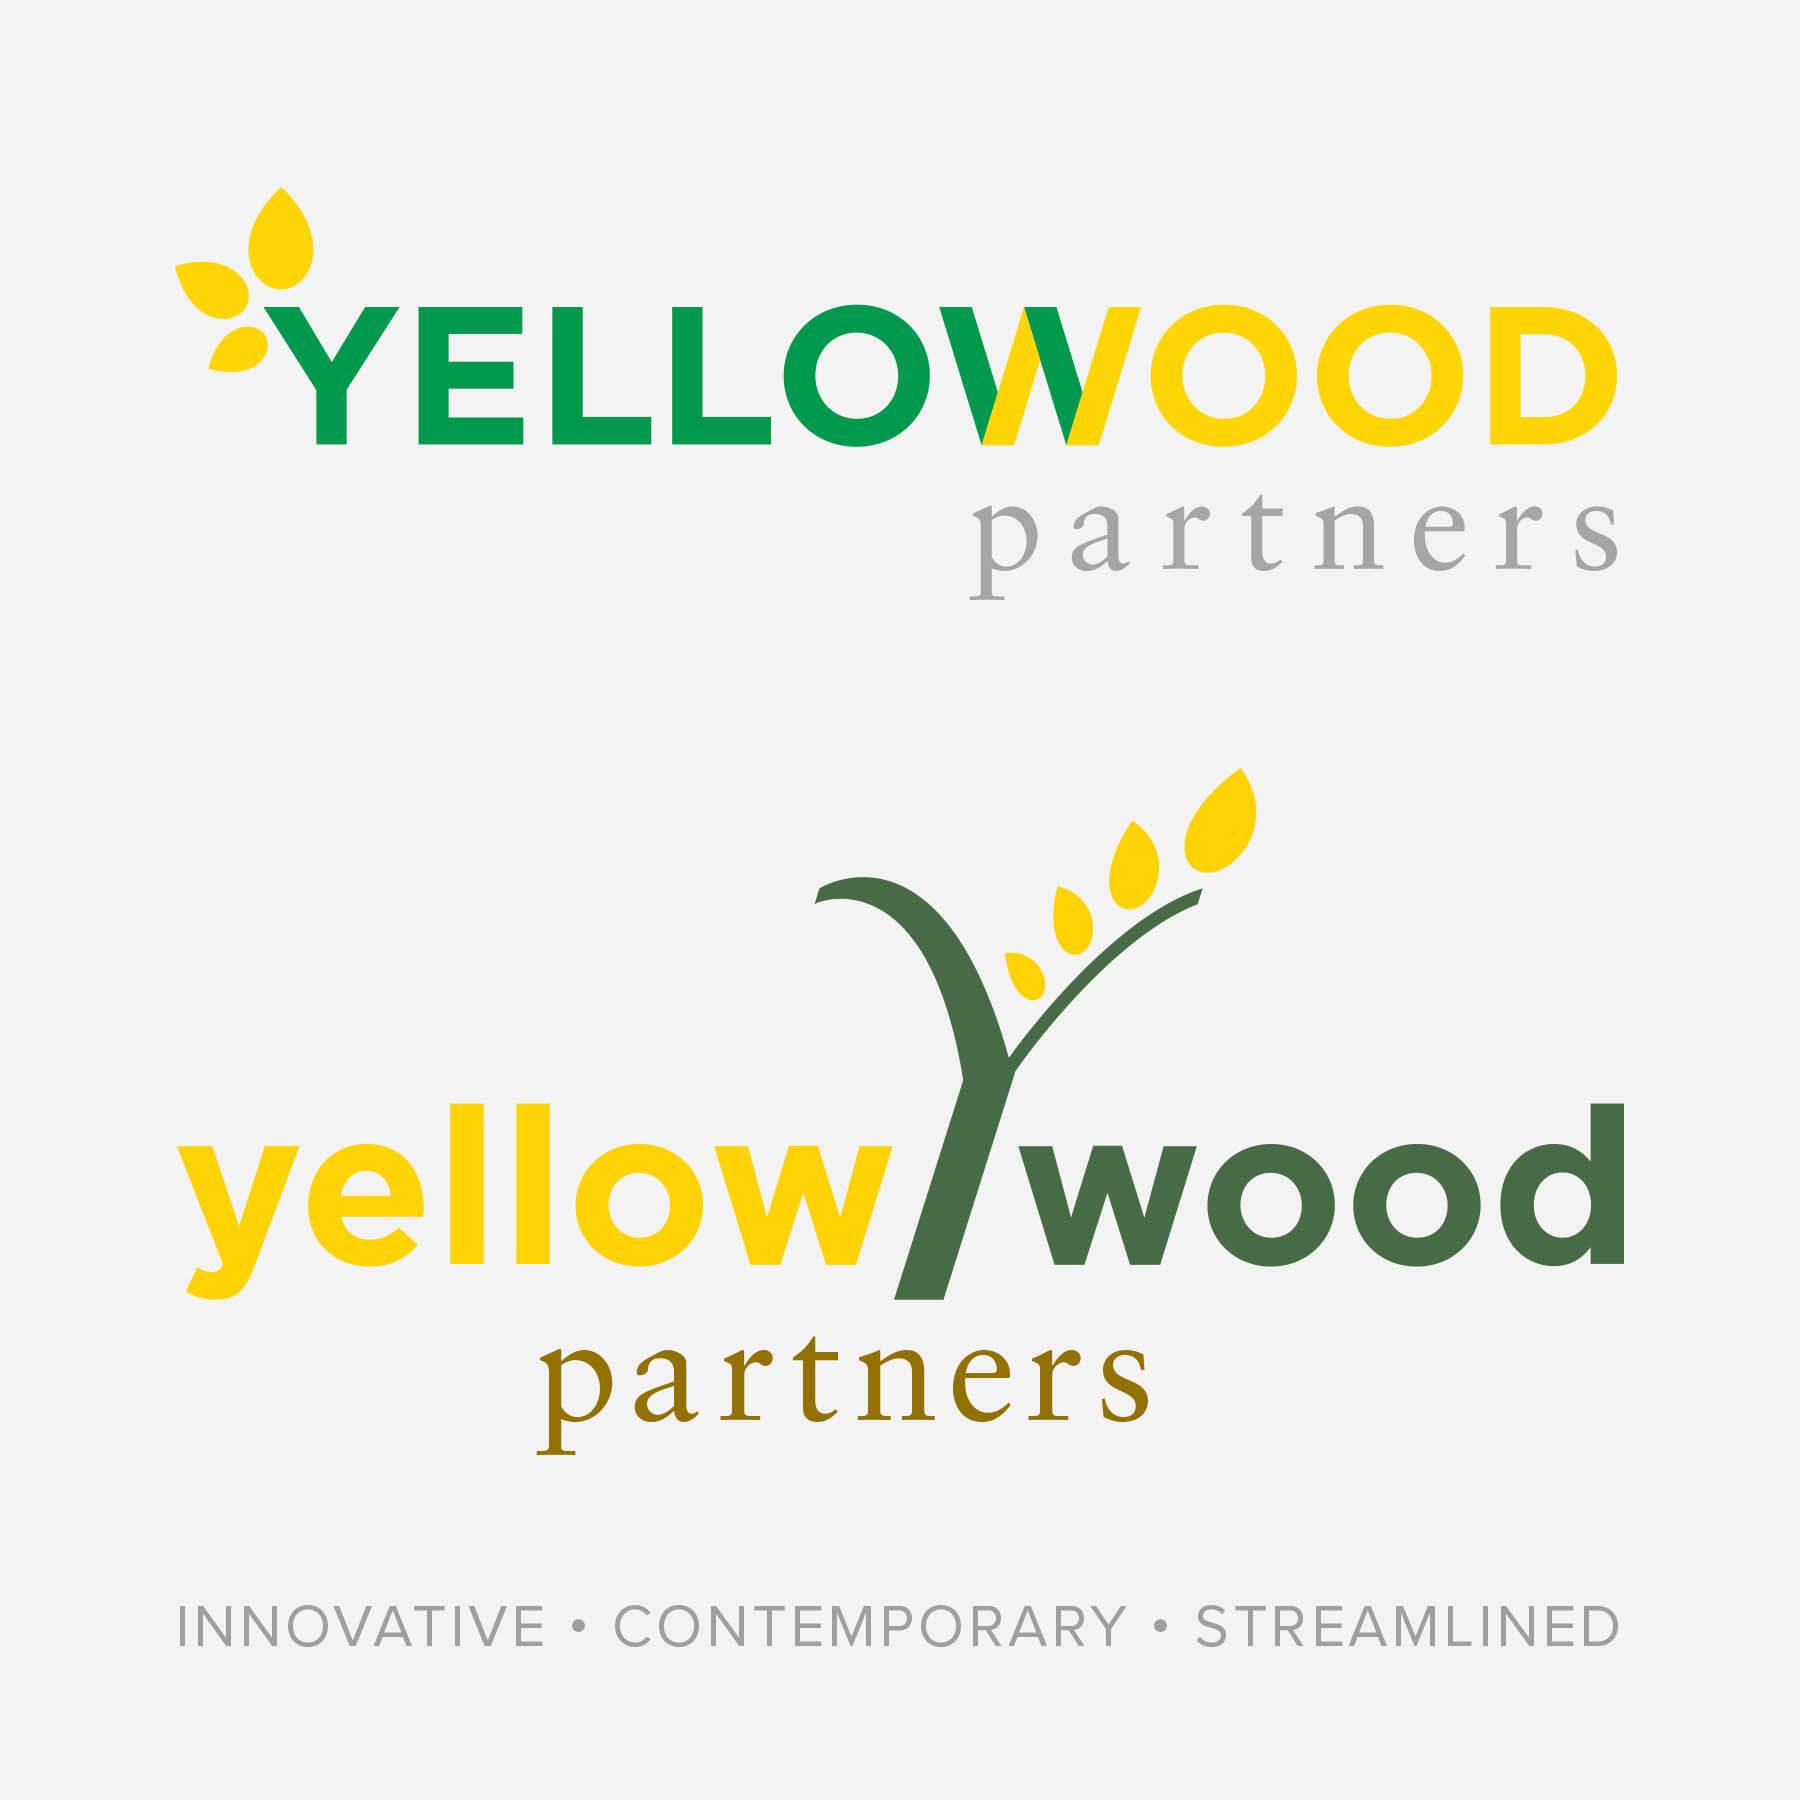 Yellow Wood Partners Sans Serif Font Logo Options